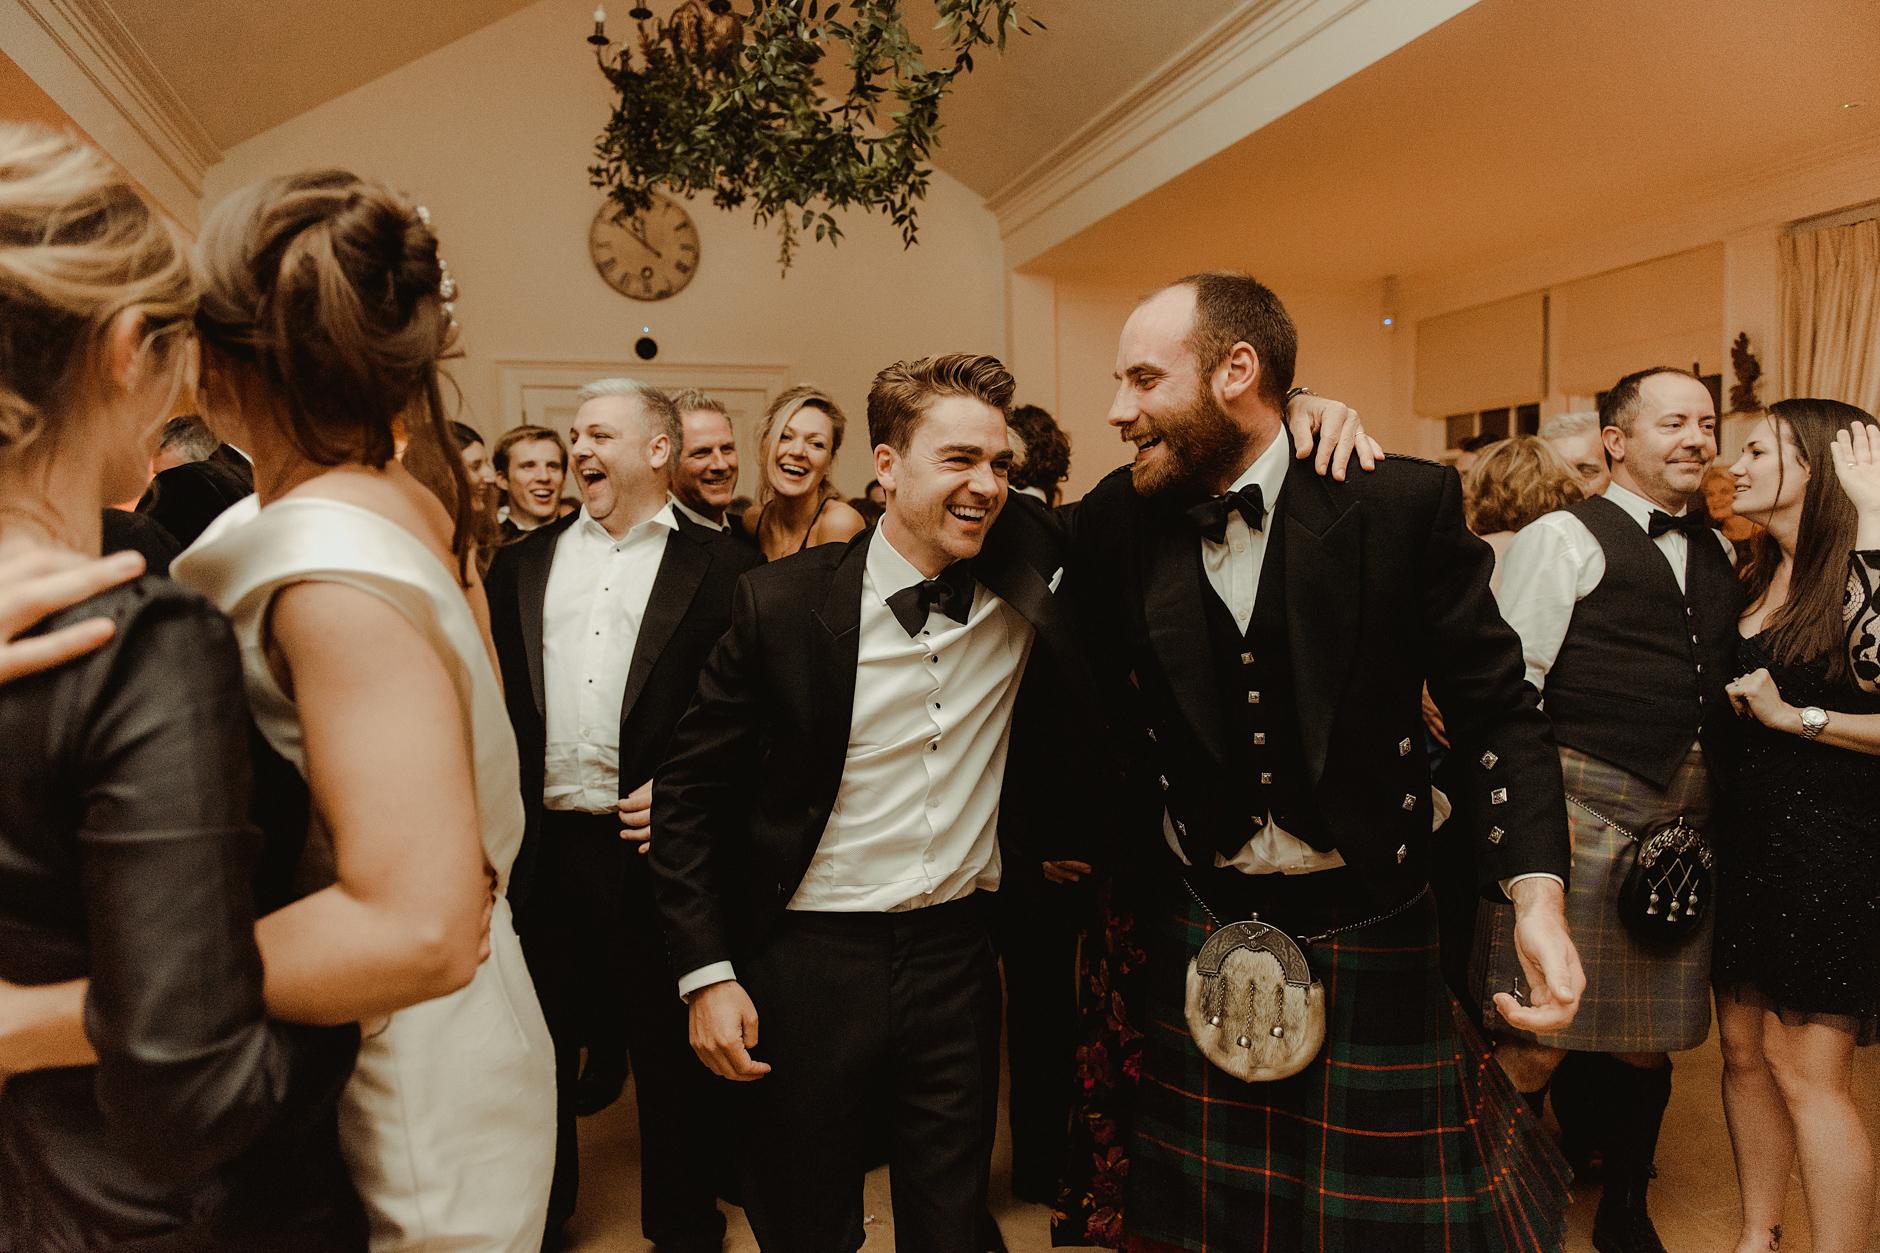 Glentruim-Wedding-Nikki-Leadbetter-Photography-364.jpg